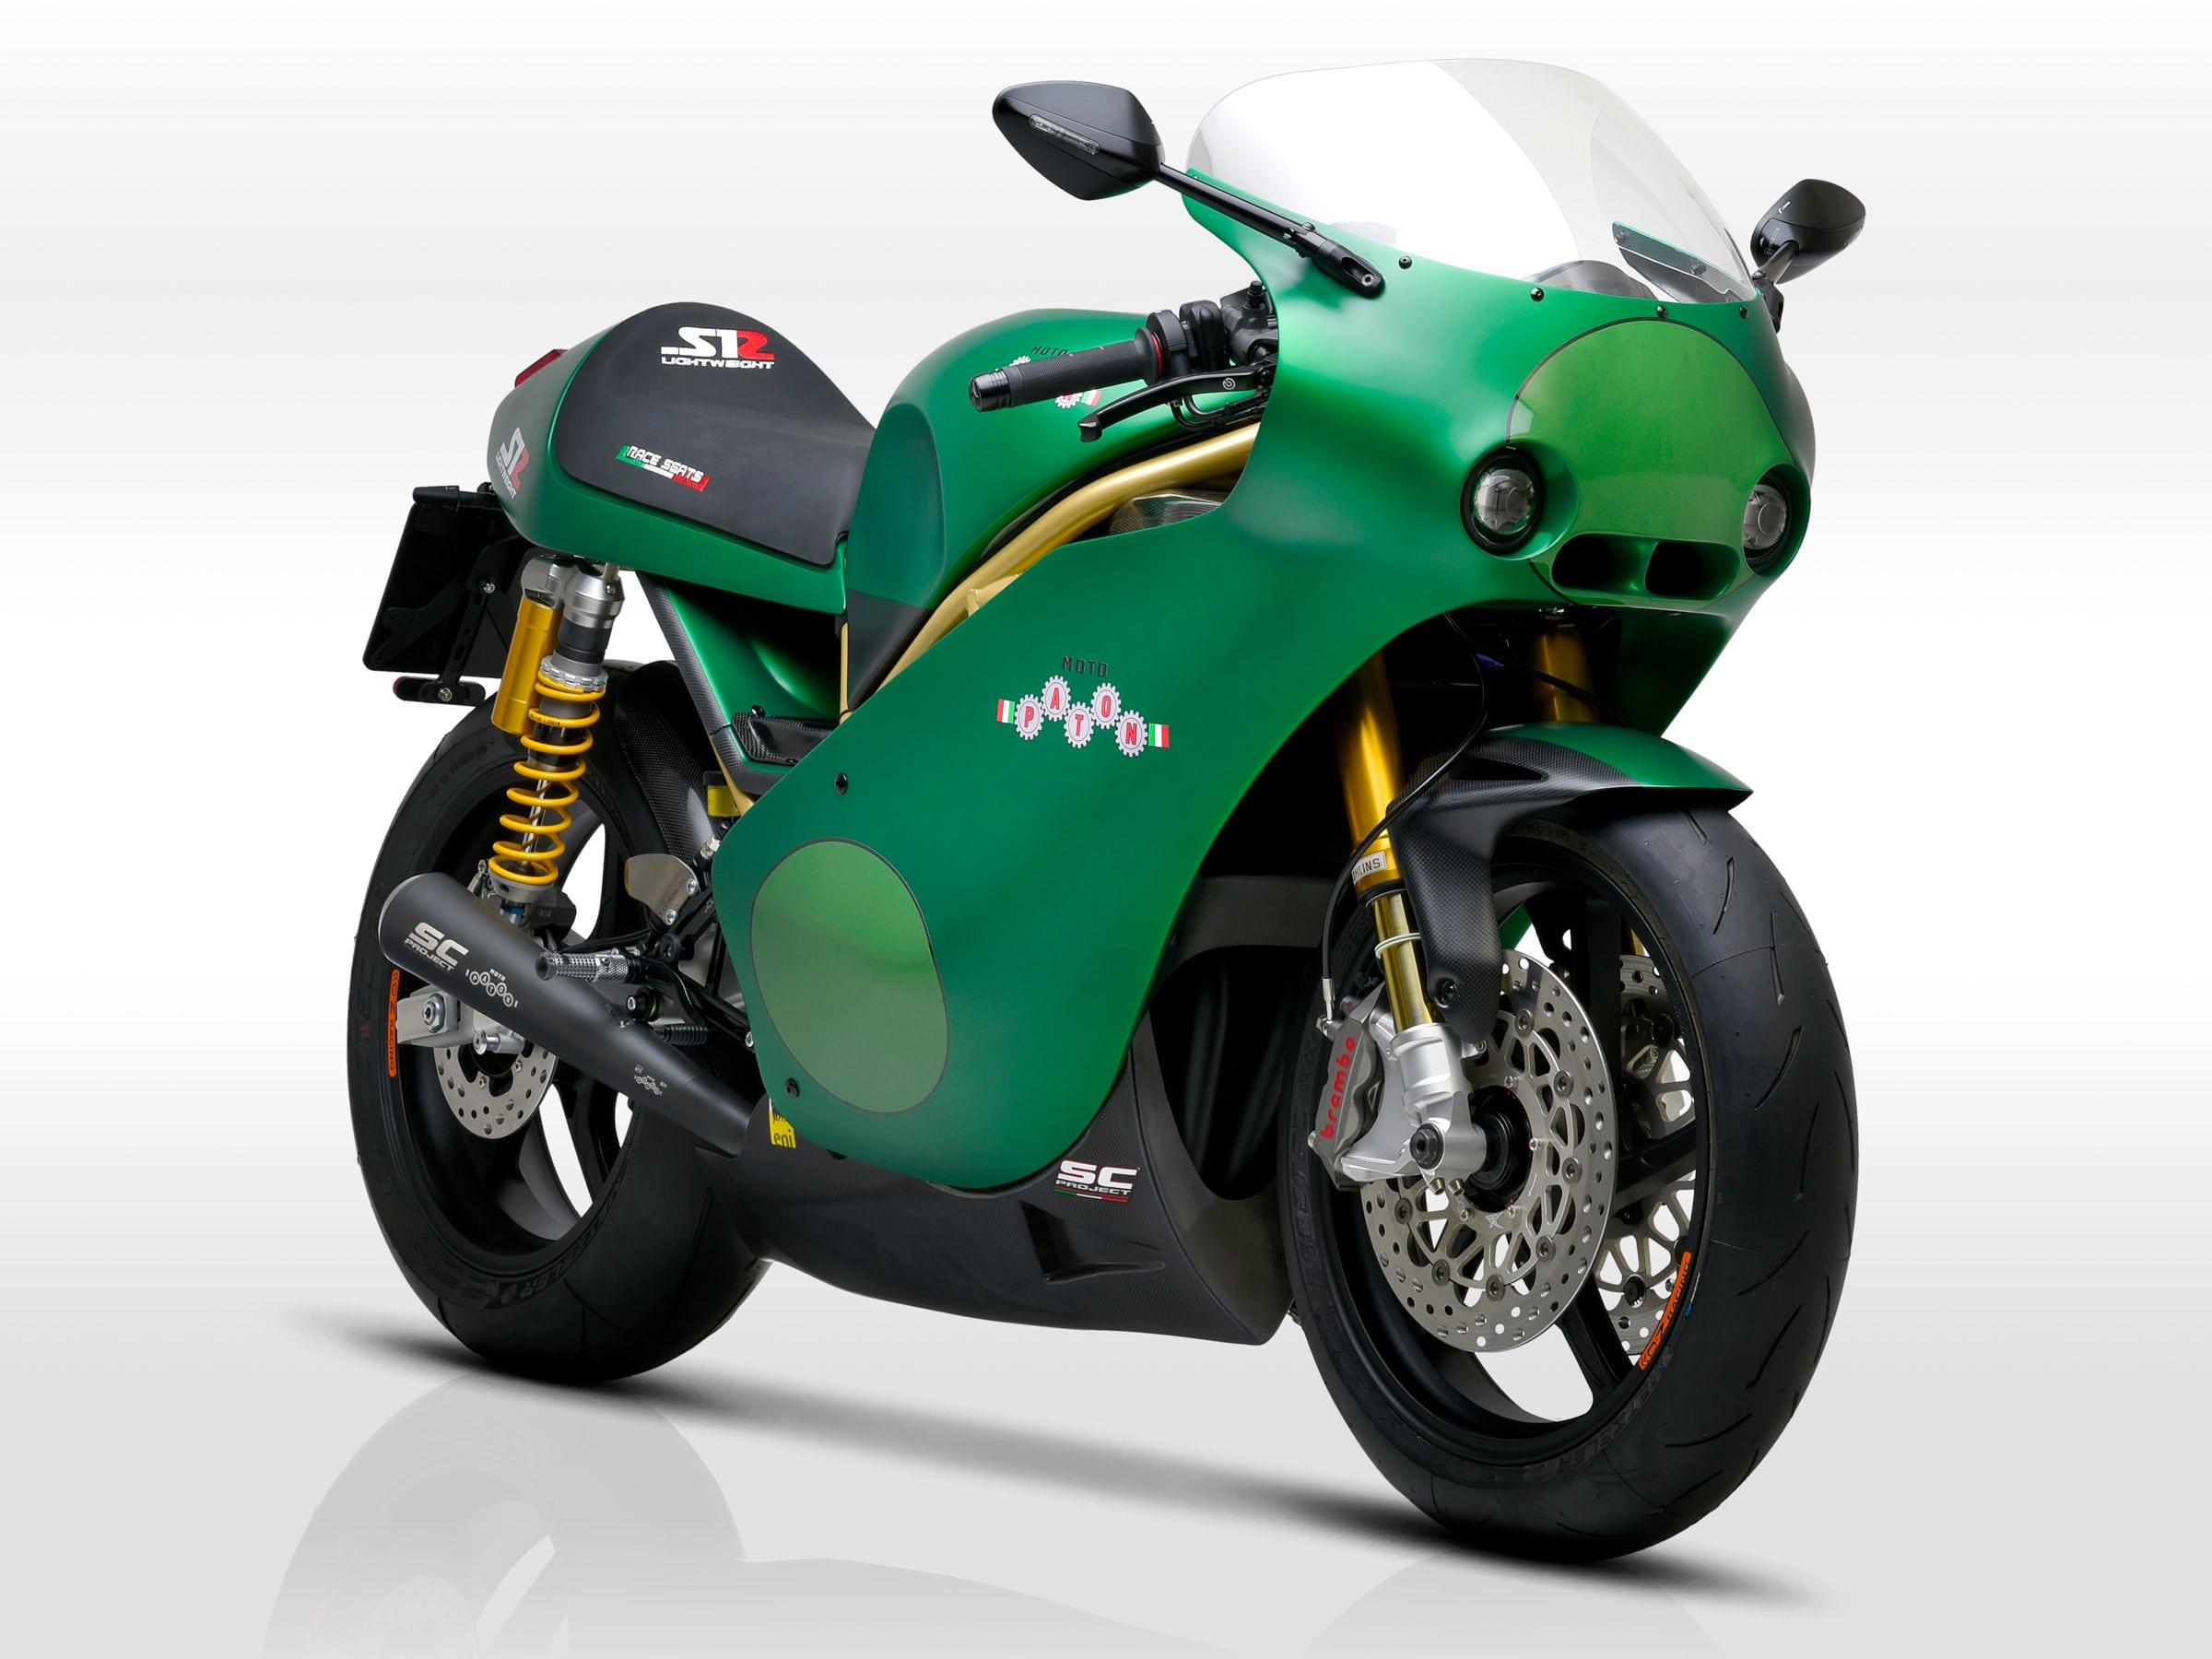 Paton_S1R-Lightweight_Stradale-Omologata_Anteriore-DX-min